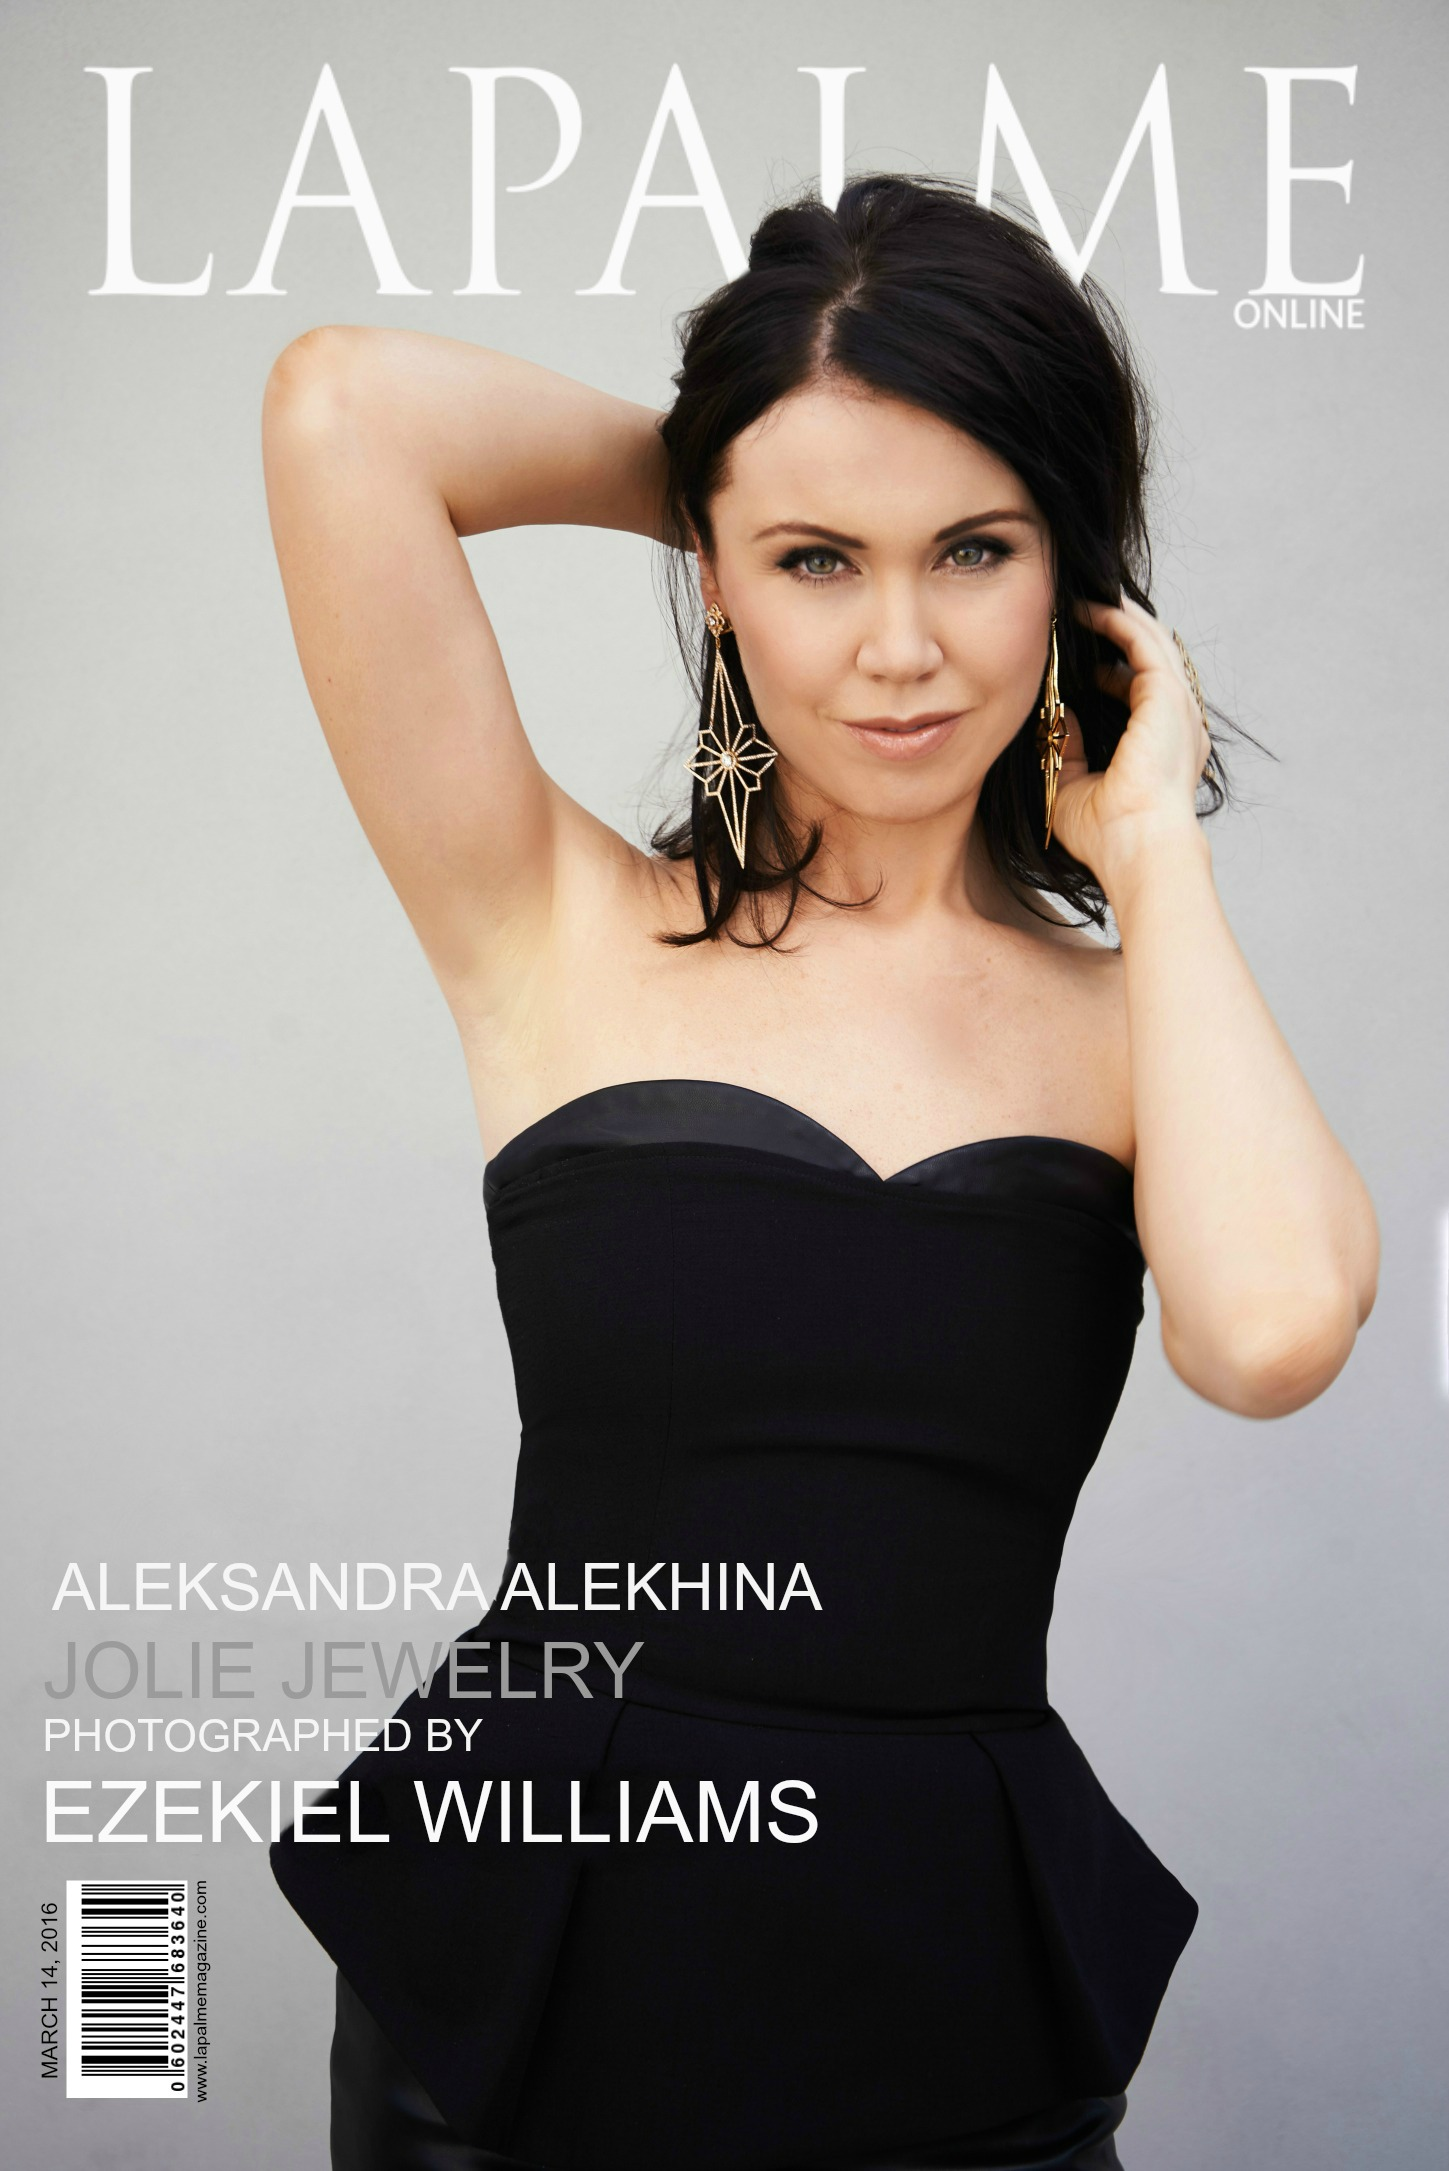 Aleksandra Alekhina of Jolie Jewelry